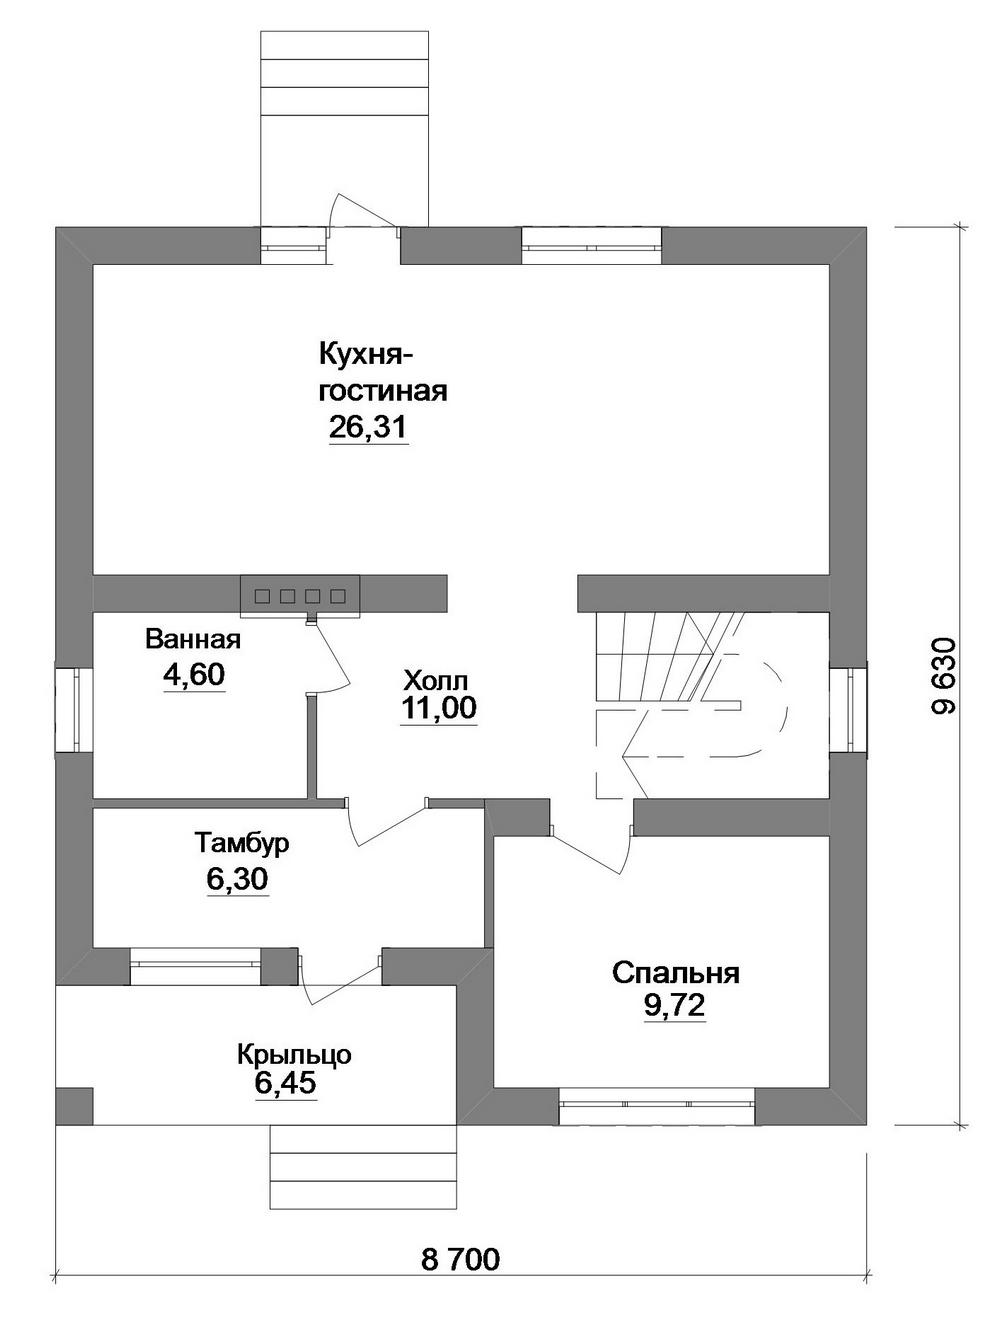 Бран B-242. Проект мансардного коттеджа, на 4 спальни, с балконом